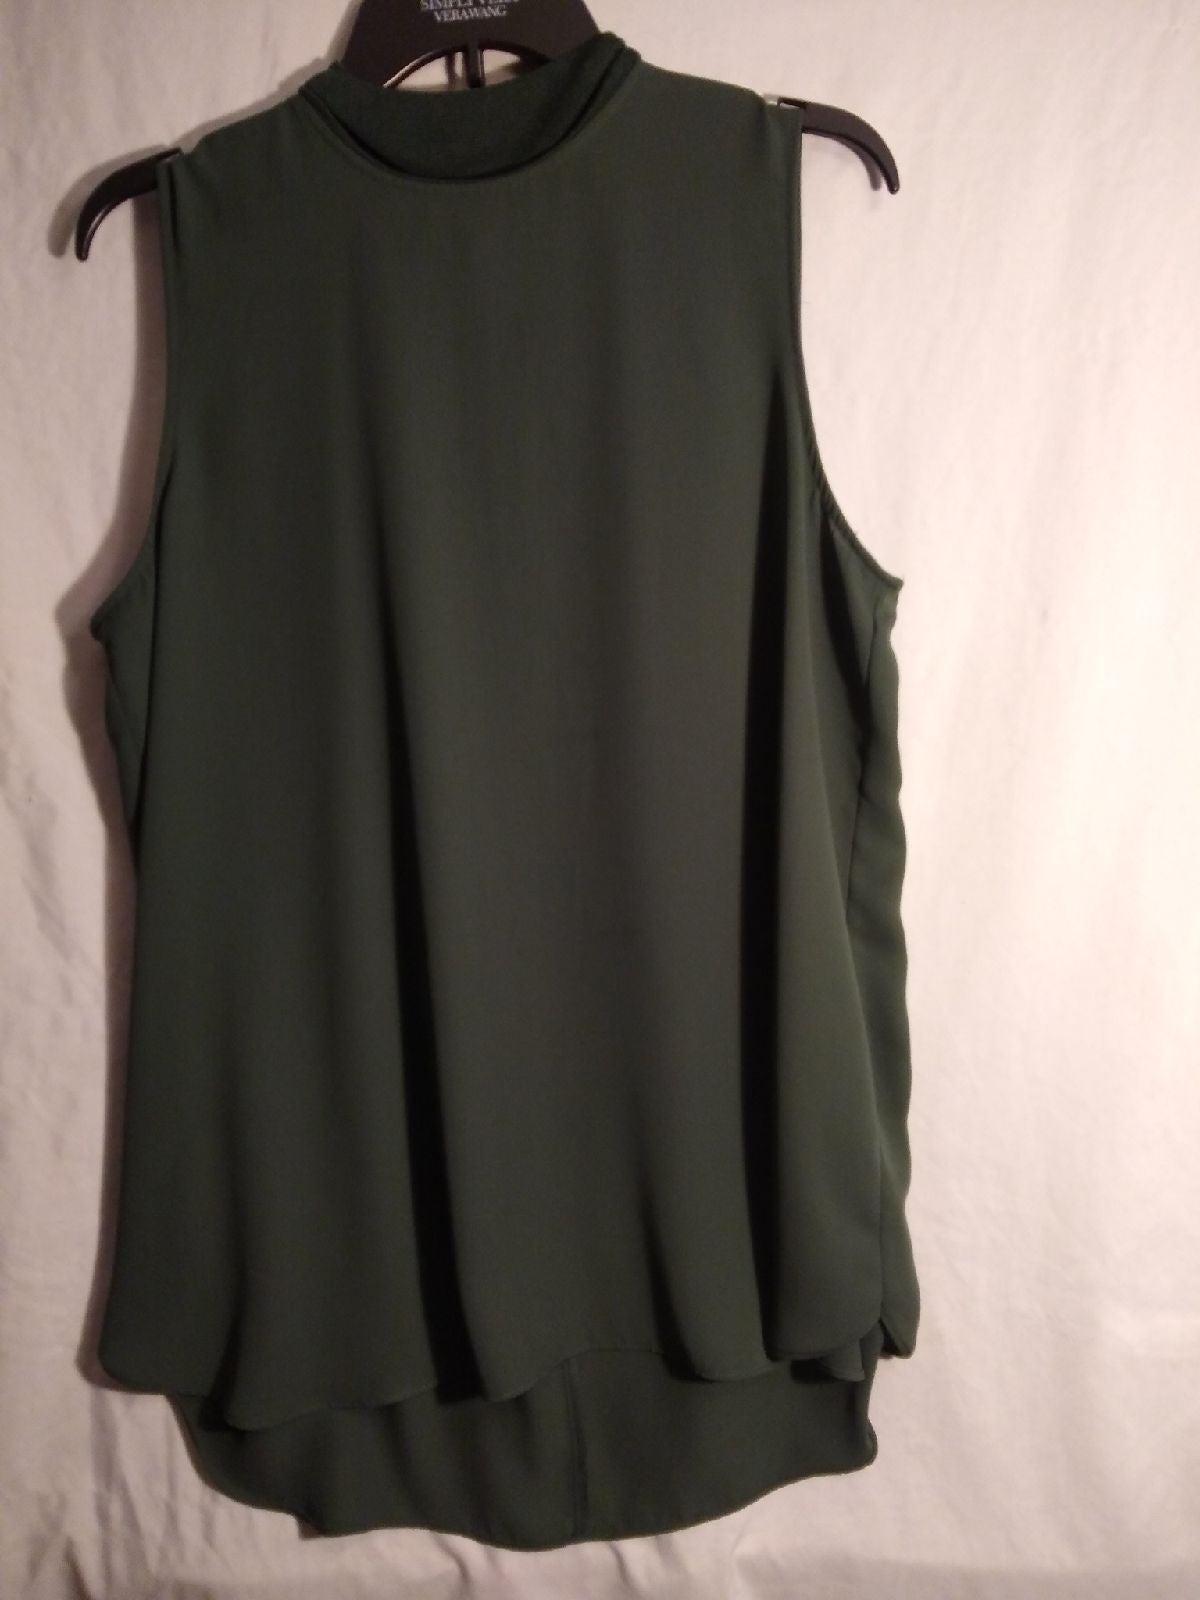 Simply Vera large sleeveless blouse